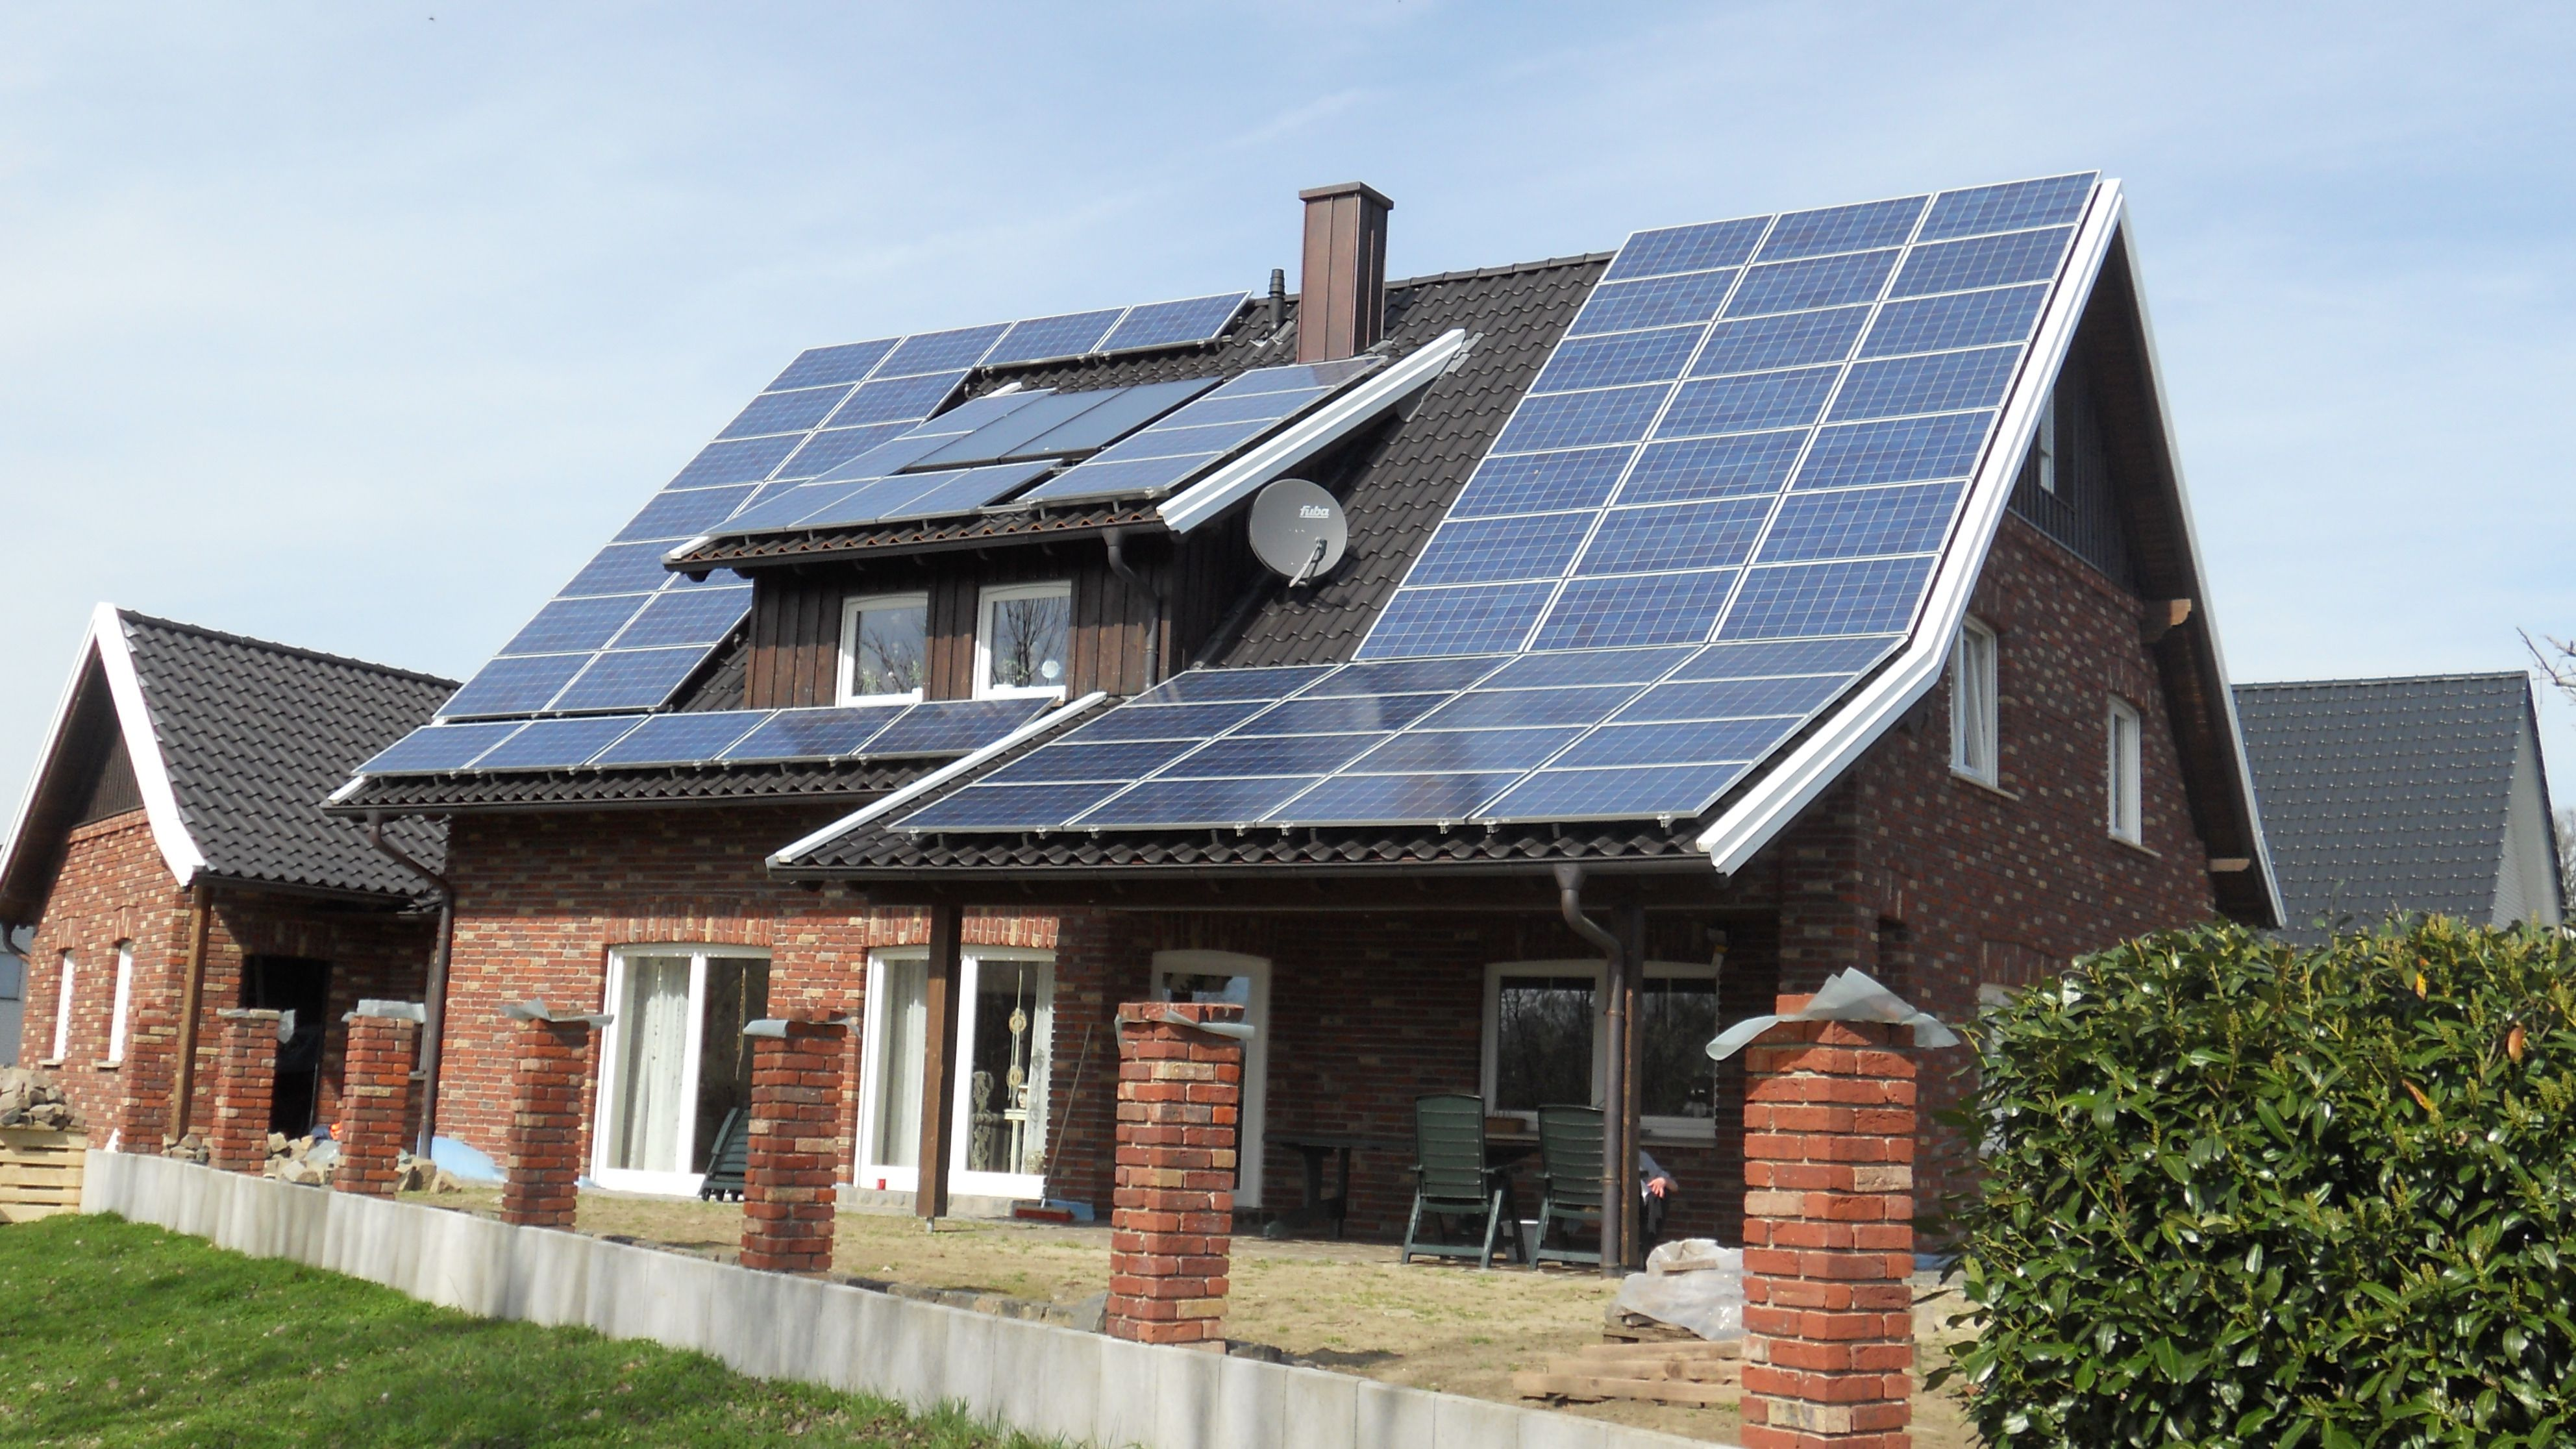 Modern Residential Rooftop Solar Panels Solar Panels Solar Solar Energy Facts